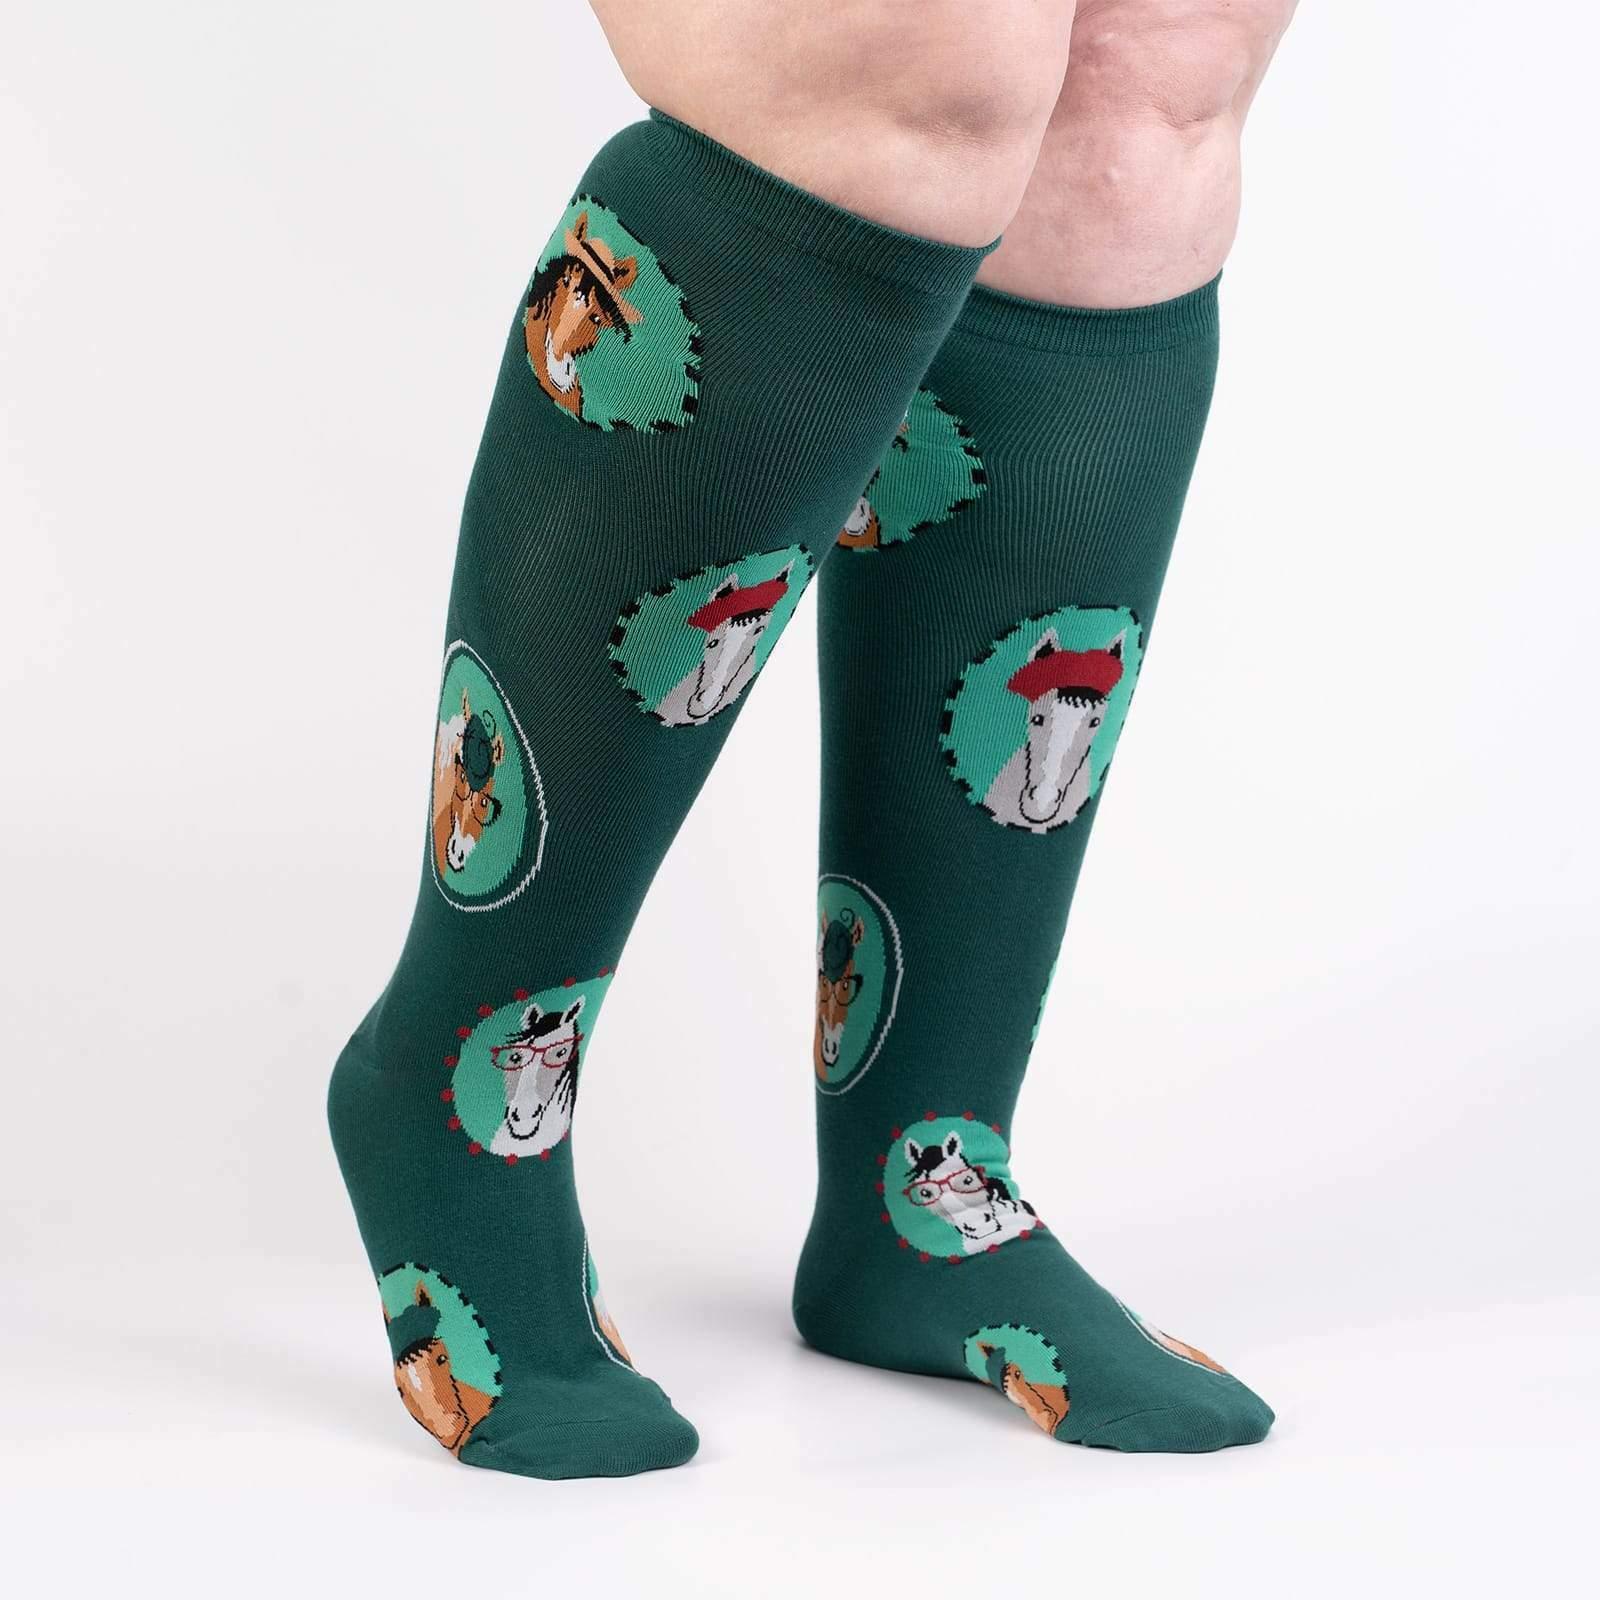 Details about  /Horsing Around Stretch-It™ Unisex Knee High Socks New XL Women 14//Men 13 Fashion